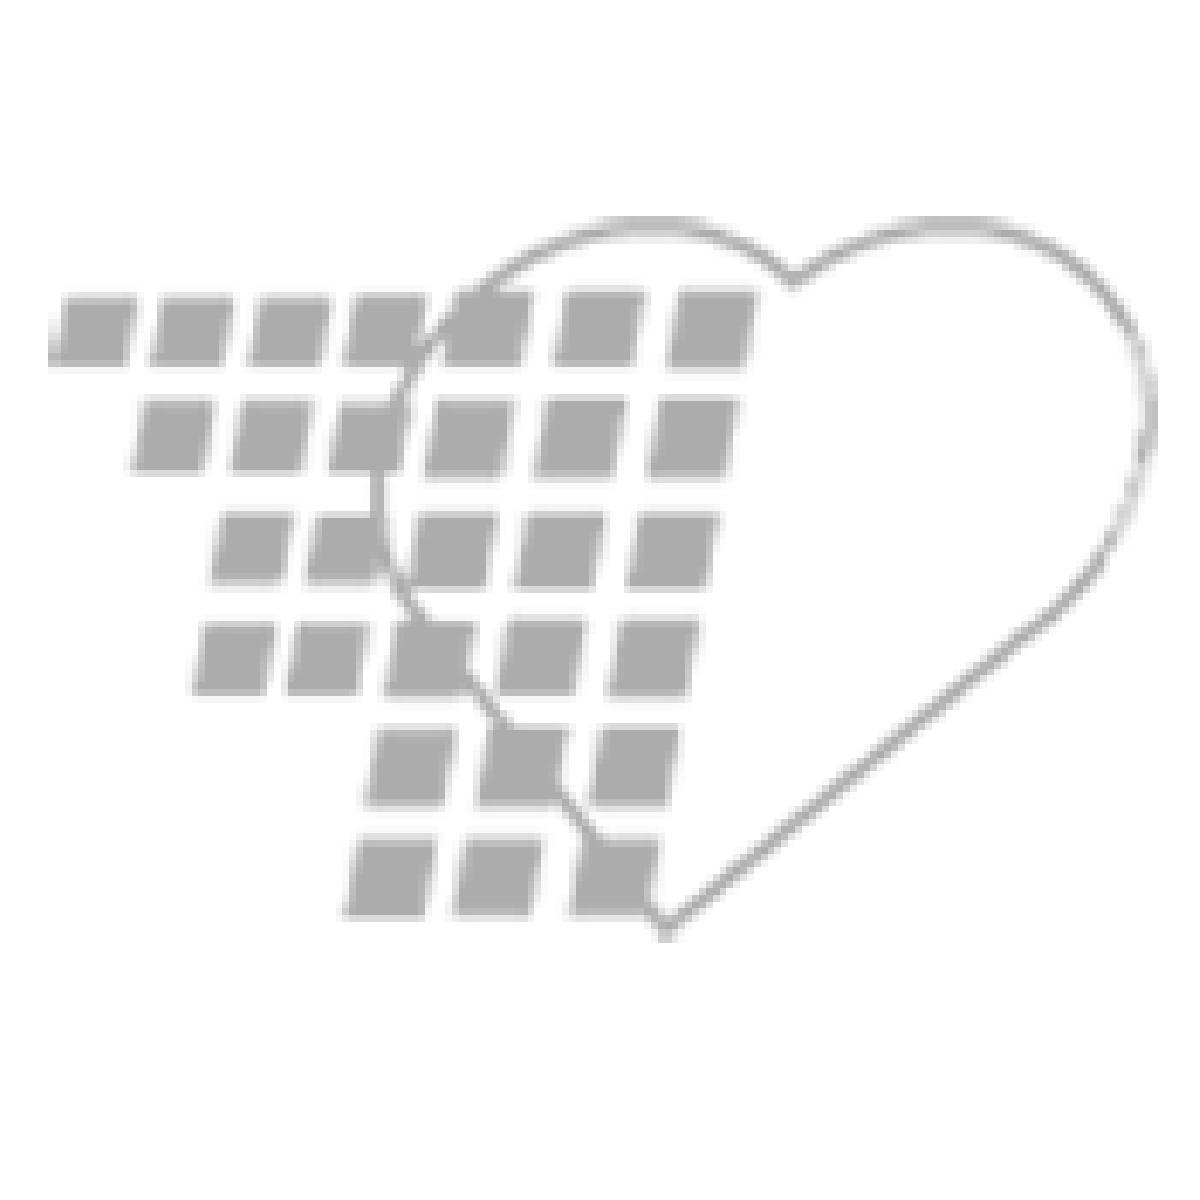 03-04-8805 Hibiclens Antiseptic & Antimicrobial Skin Cleanse